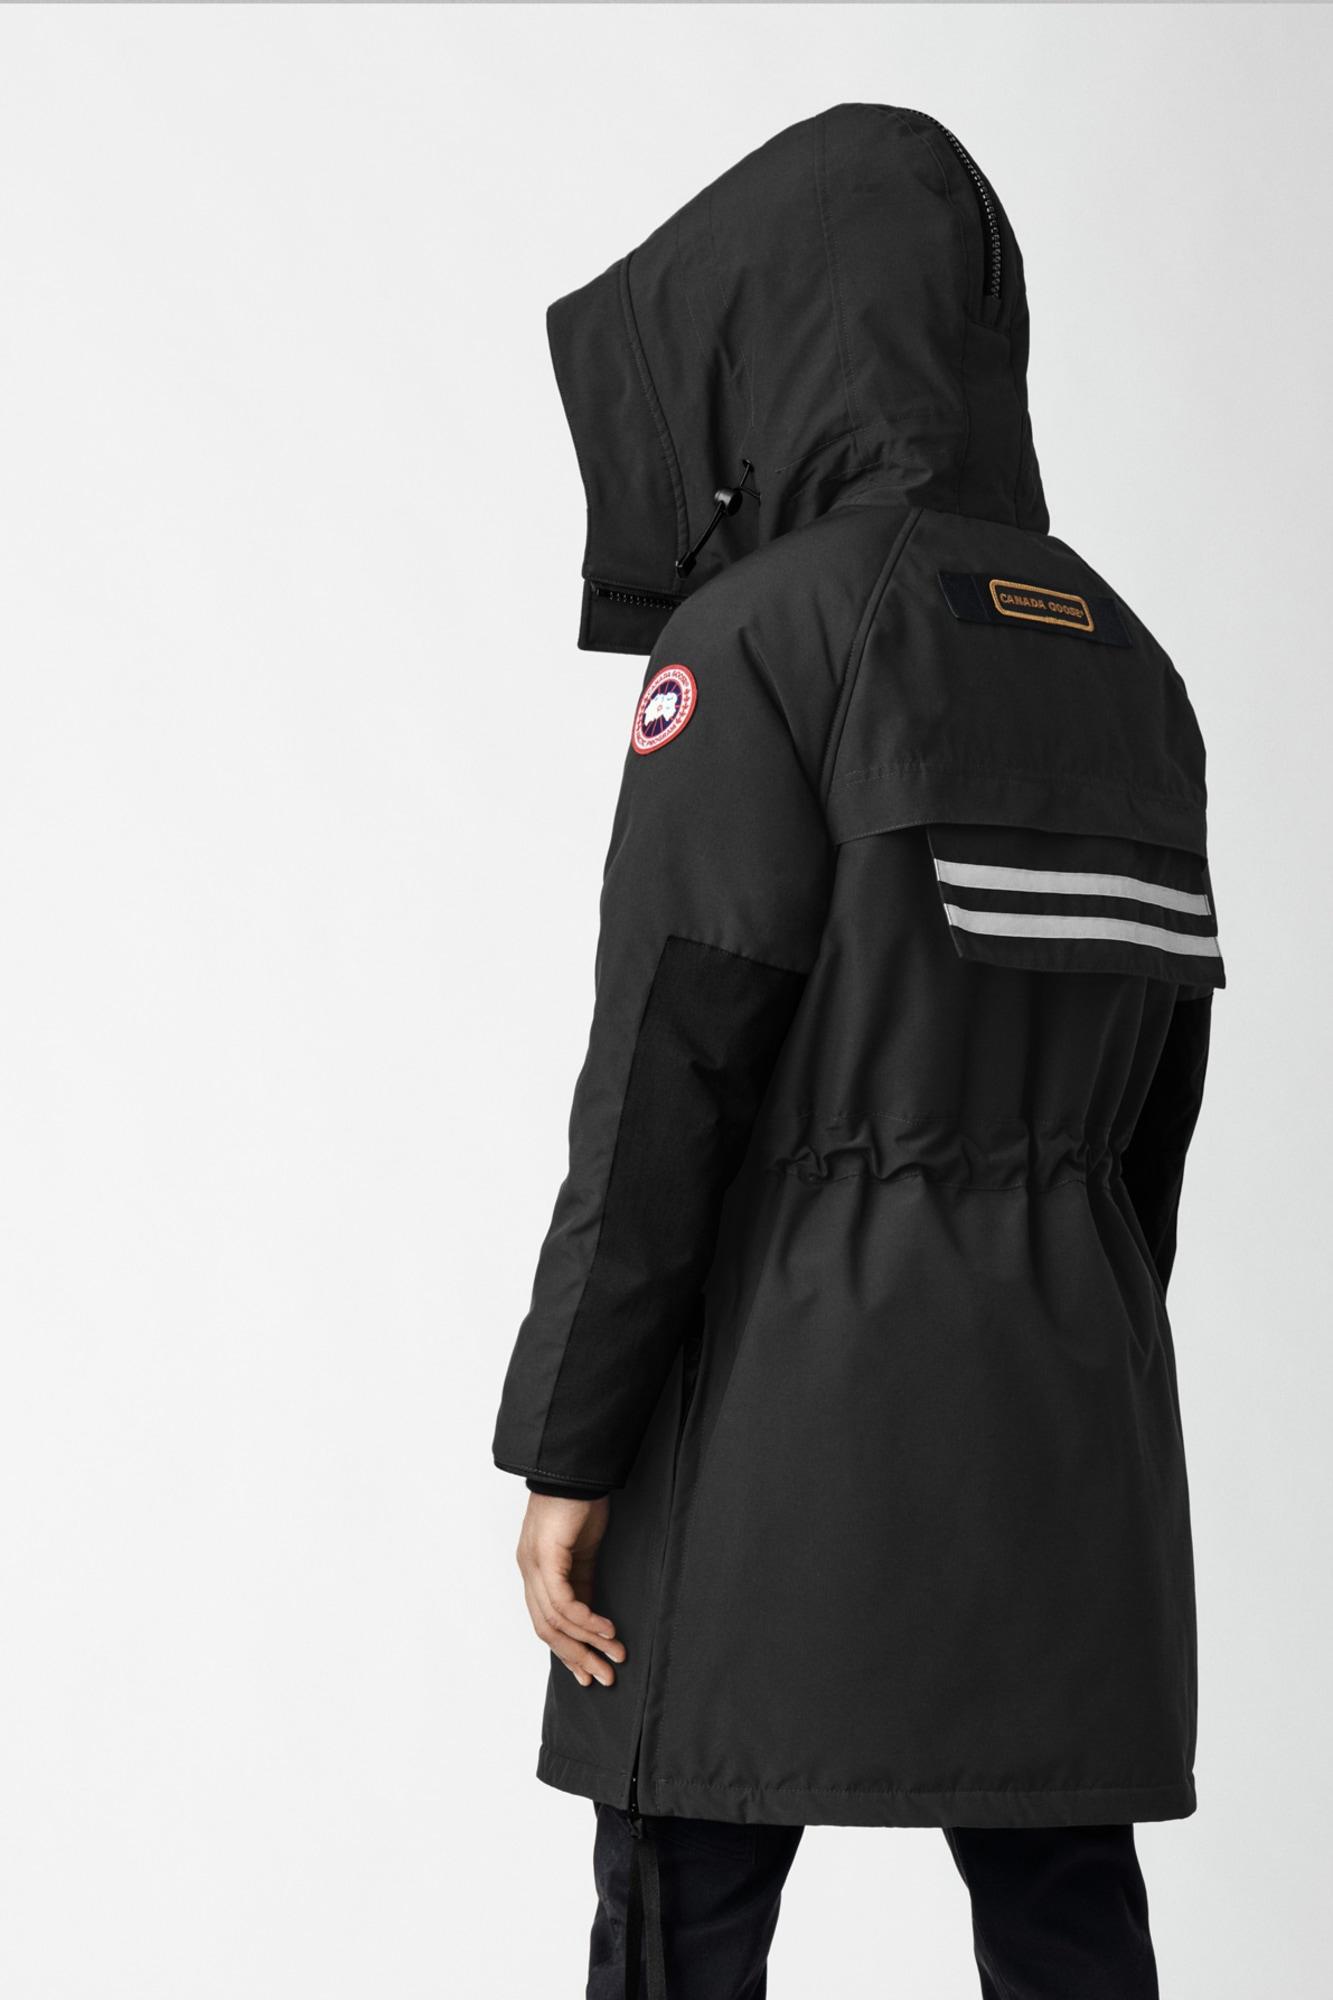 a300cc141d Women's Olympia Parka | Canada Goose®